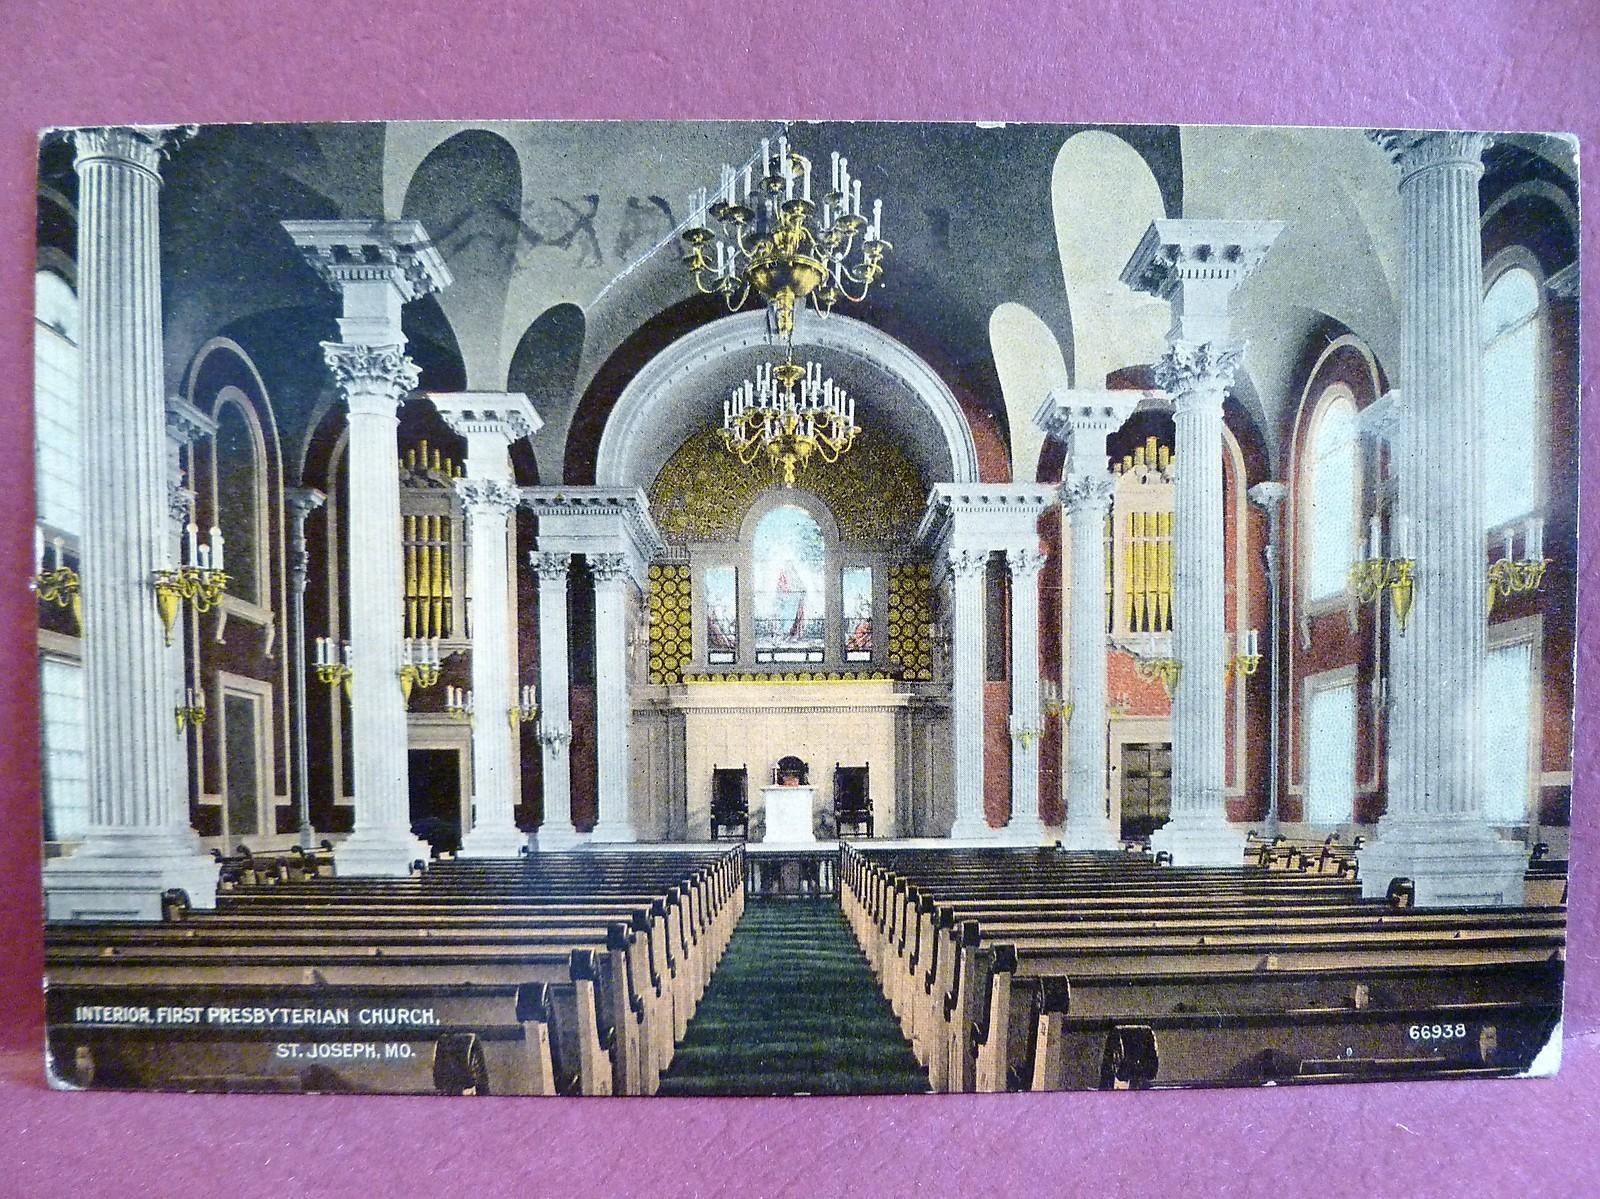 First Presbyterian Church, St. Joseph, MO